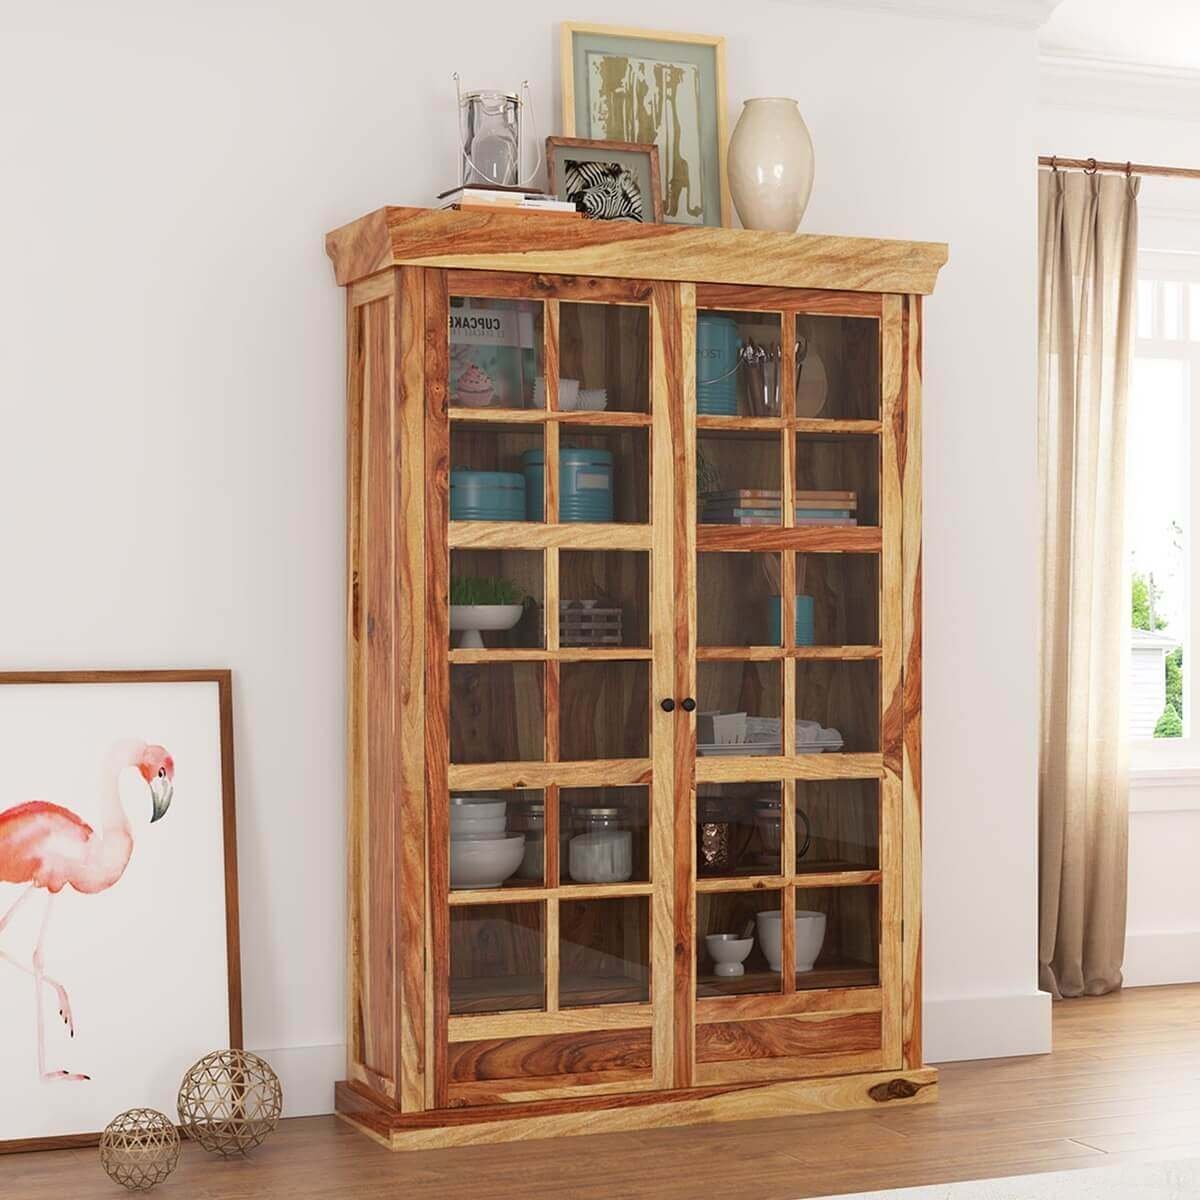 Peoria Rustic Solid Wood Glass Door Large Storage Cabinet